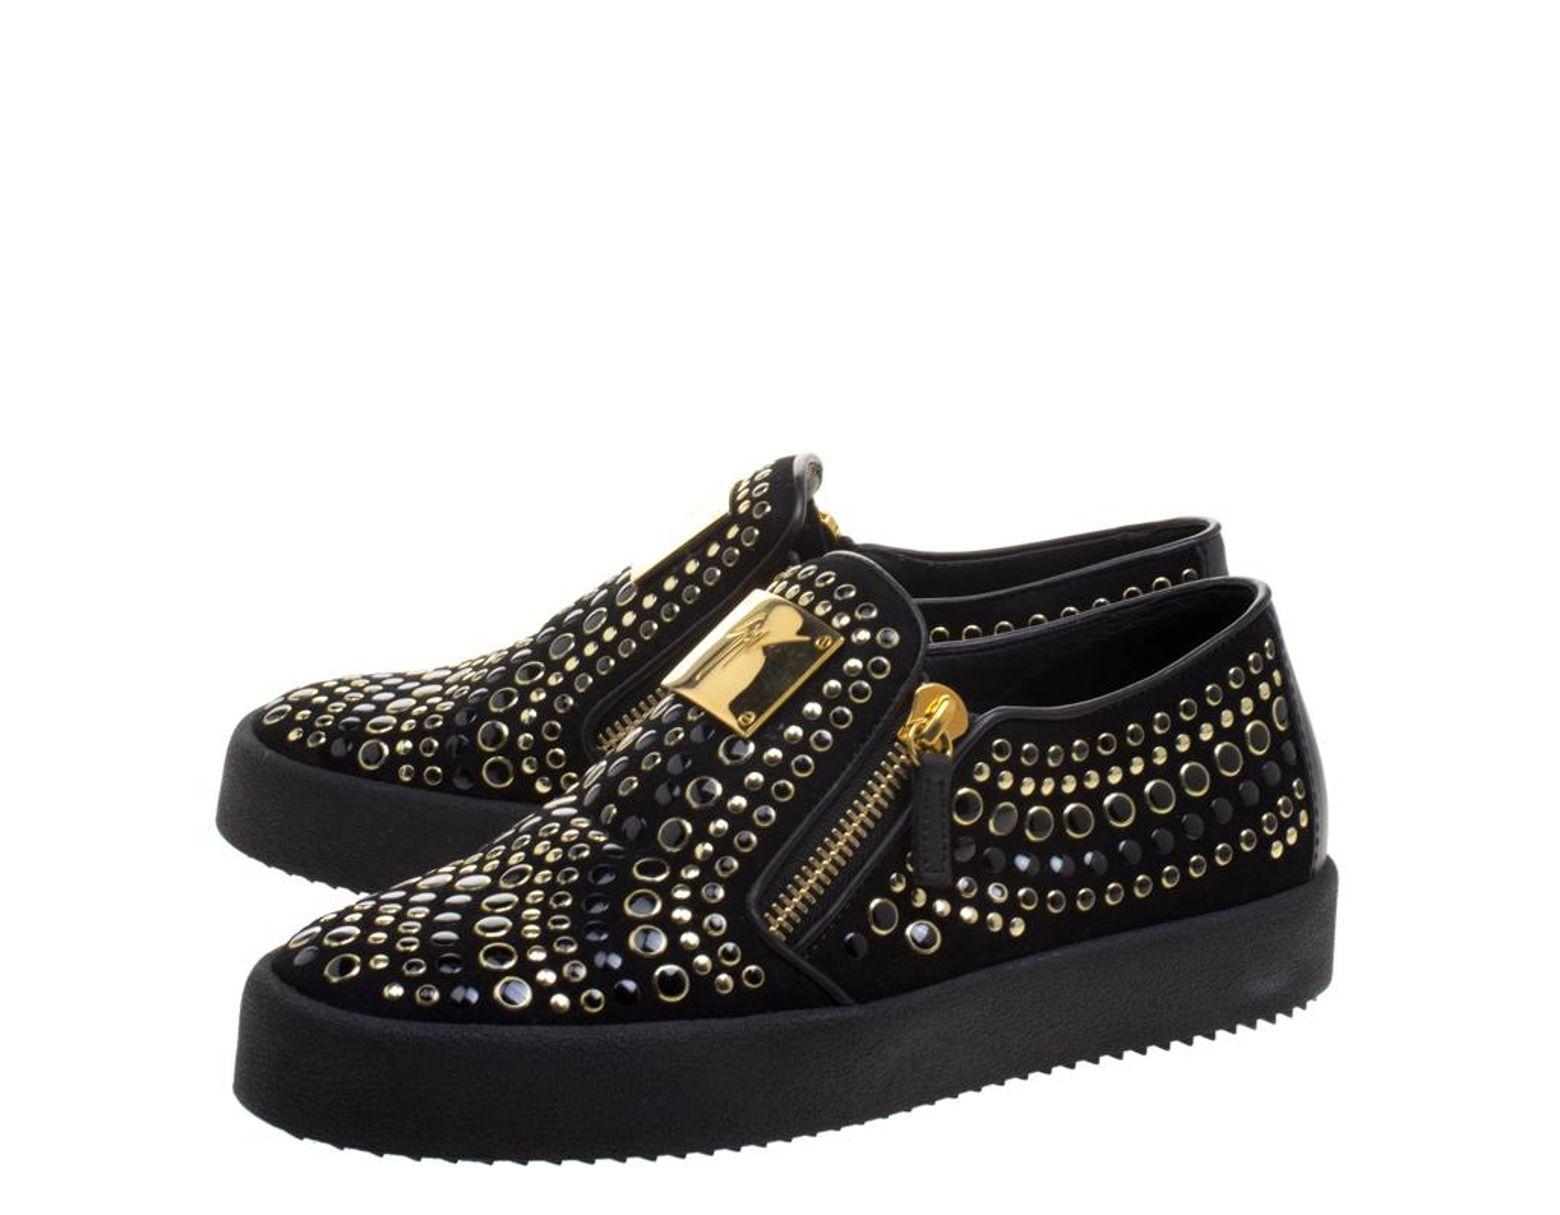 0abb6e3a9309b Giuseppe Zanotti Black Stud Embellished Suede Eve Slip On Sneakers Size 40  in Black - Lyst